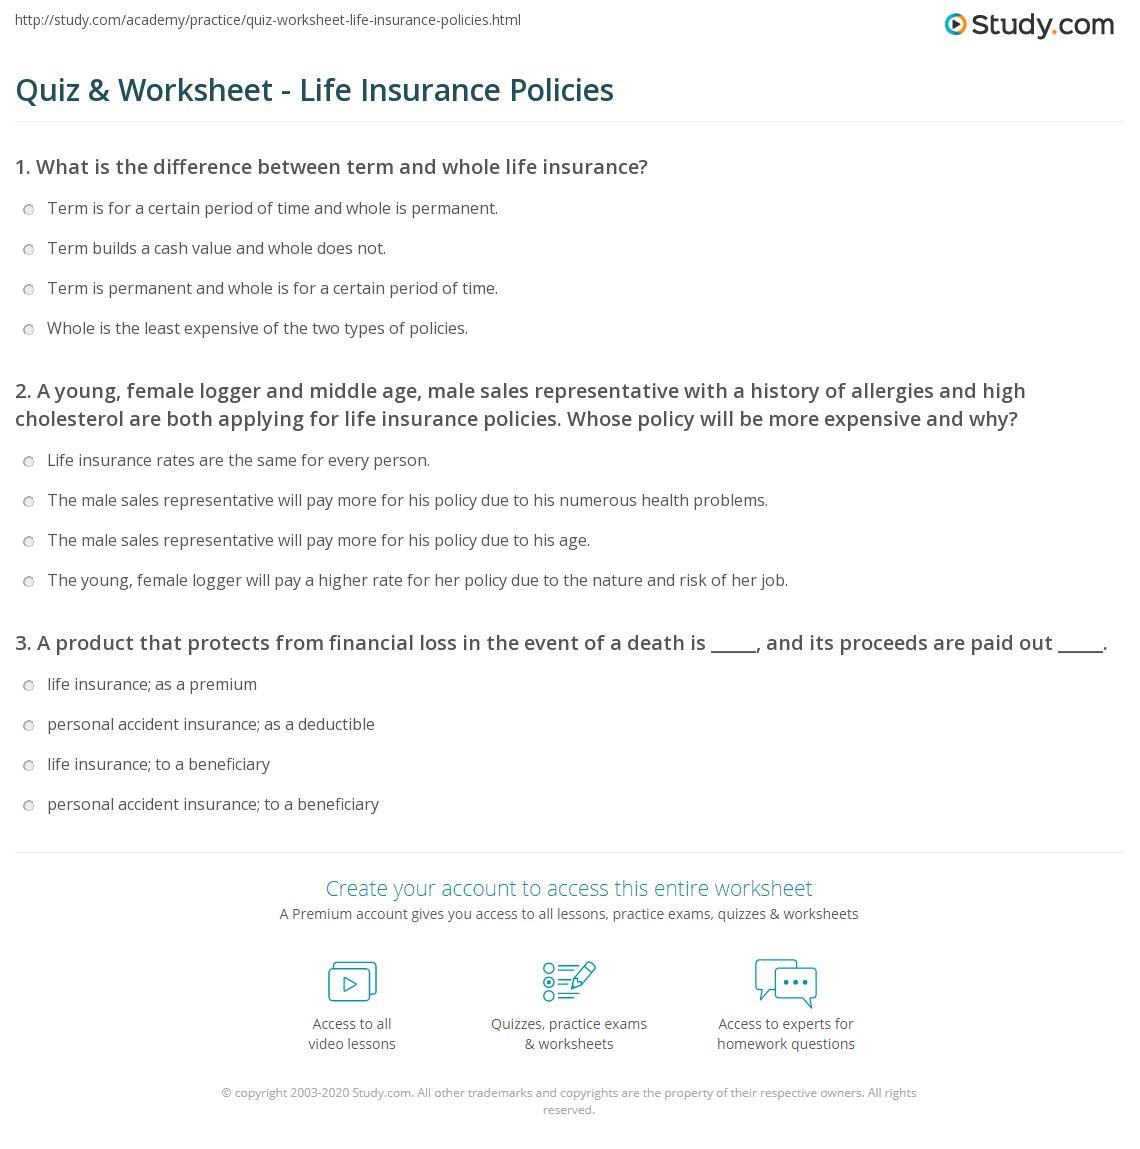 Quiz W Ksheet L E Sur Nce Policies Study